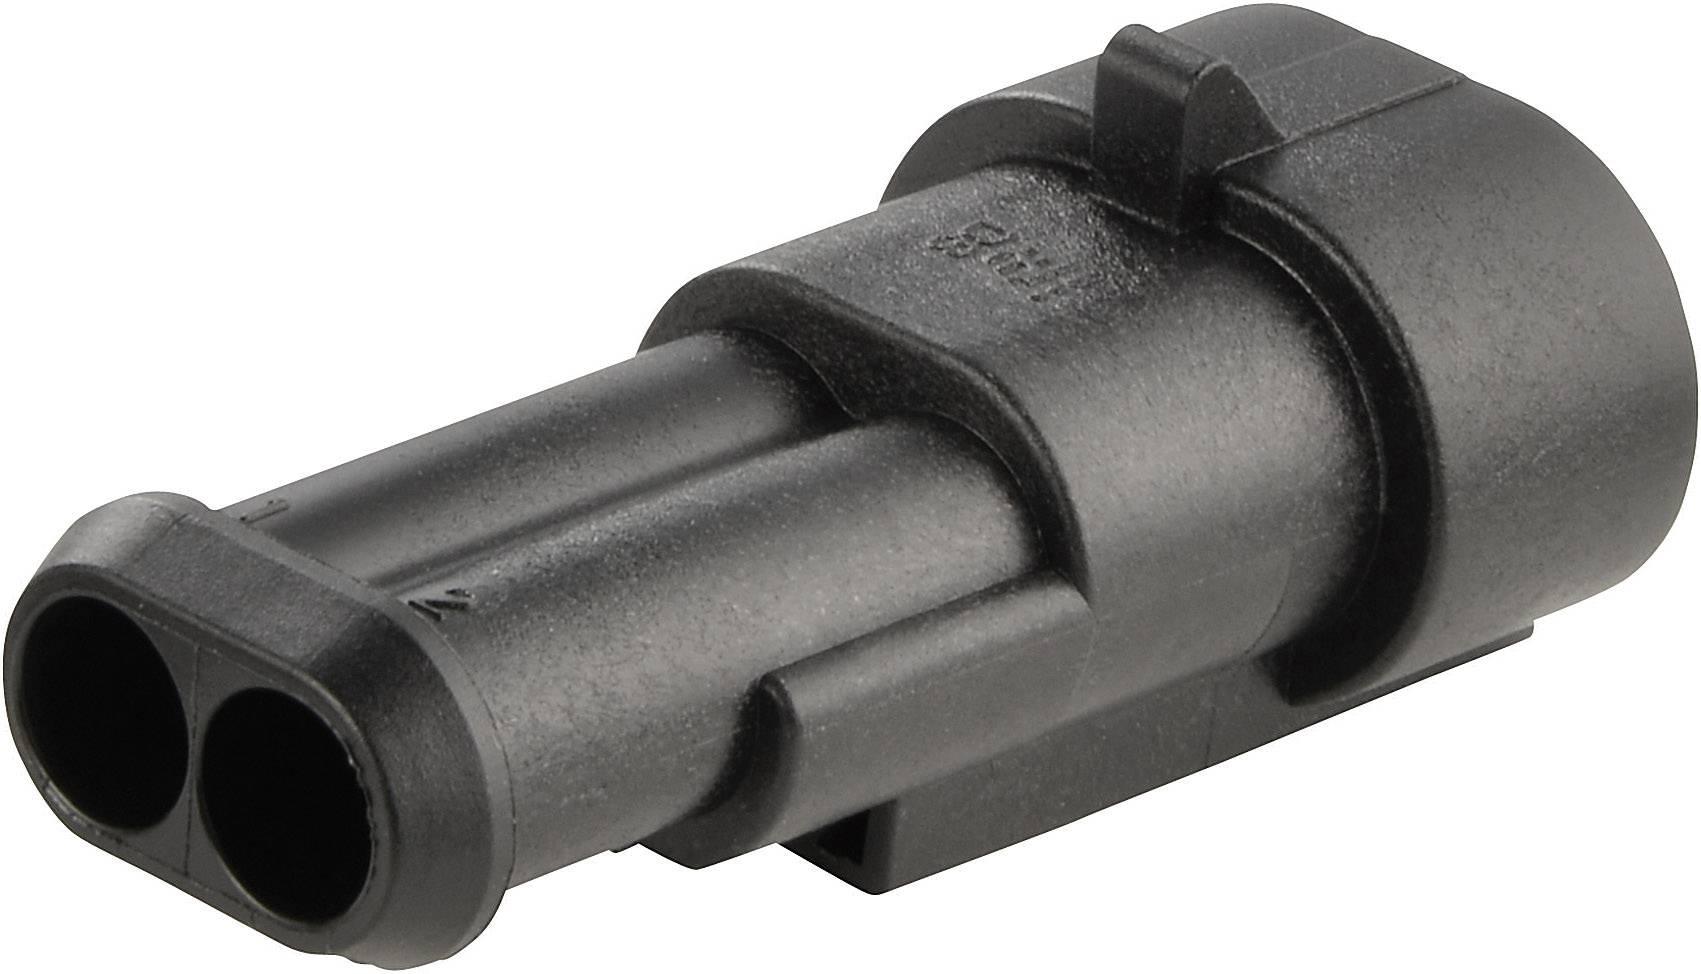 Zásuvkové púzdro na kábel TE Connectivity 282104-1 282104-1, 42 mm, pólů 2, rozteč 6 mm, 1 ks